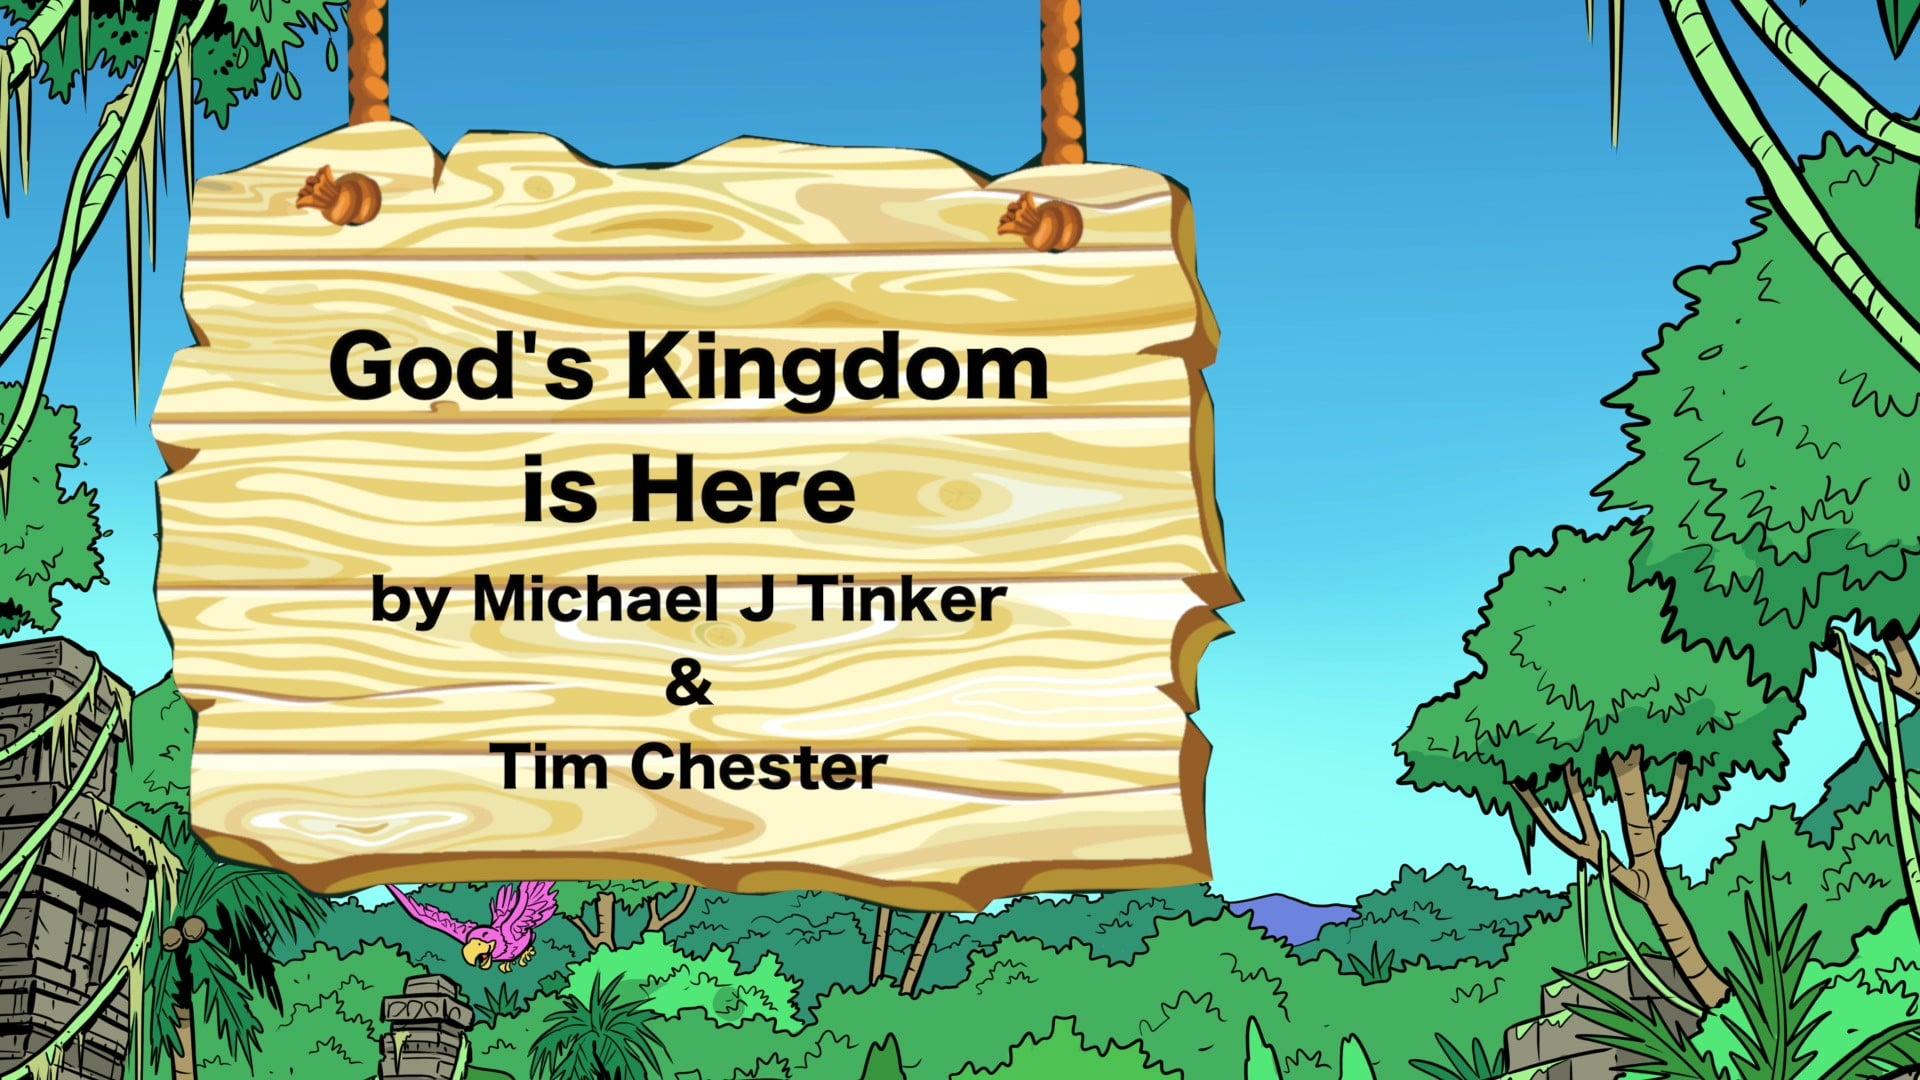 God's Kingdom is Here